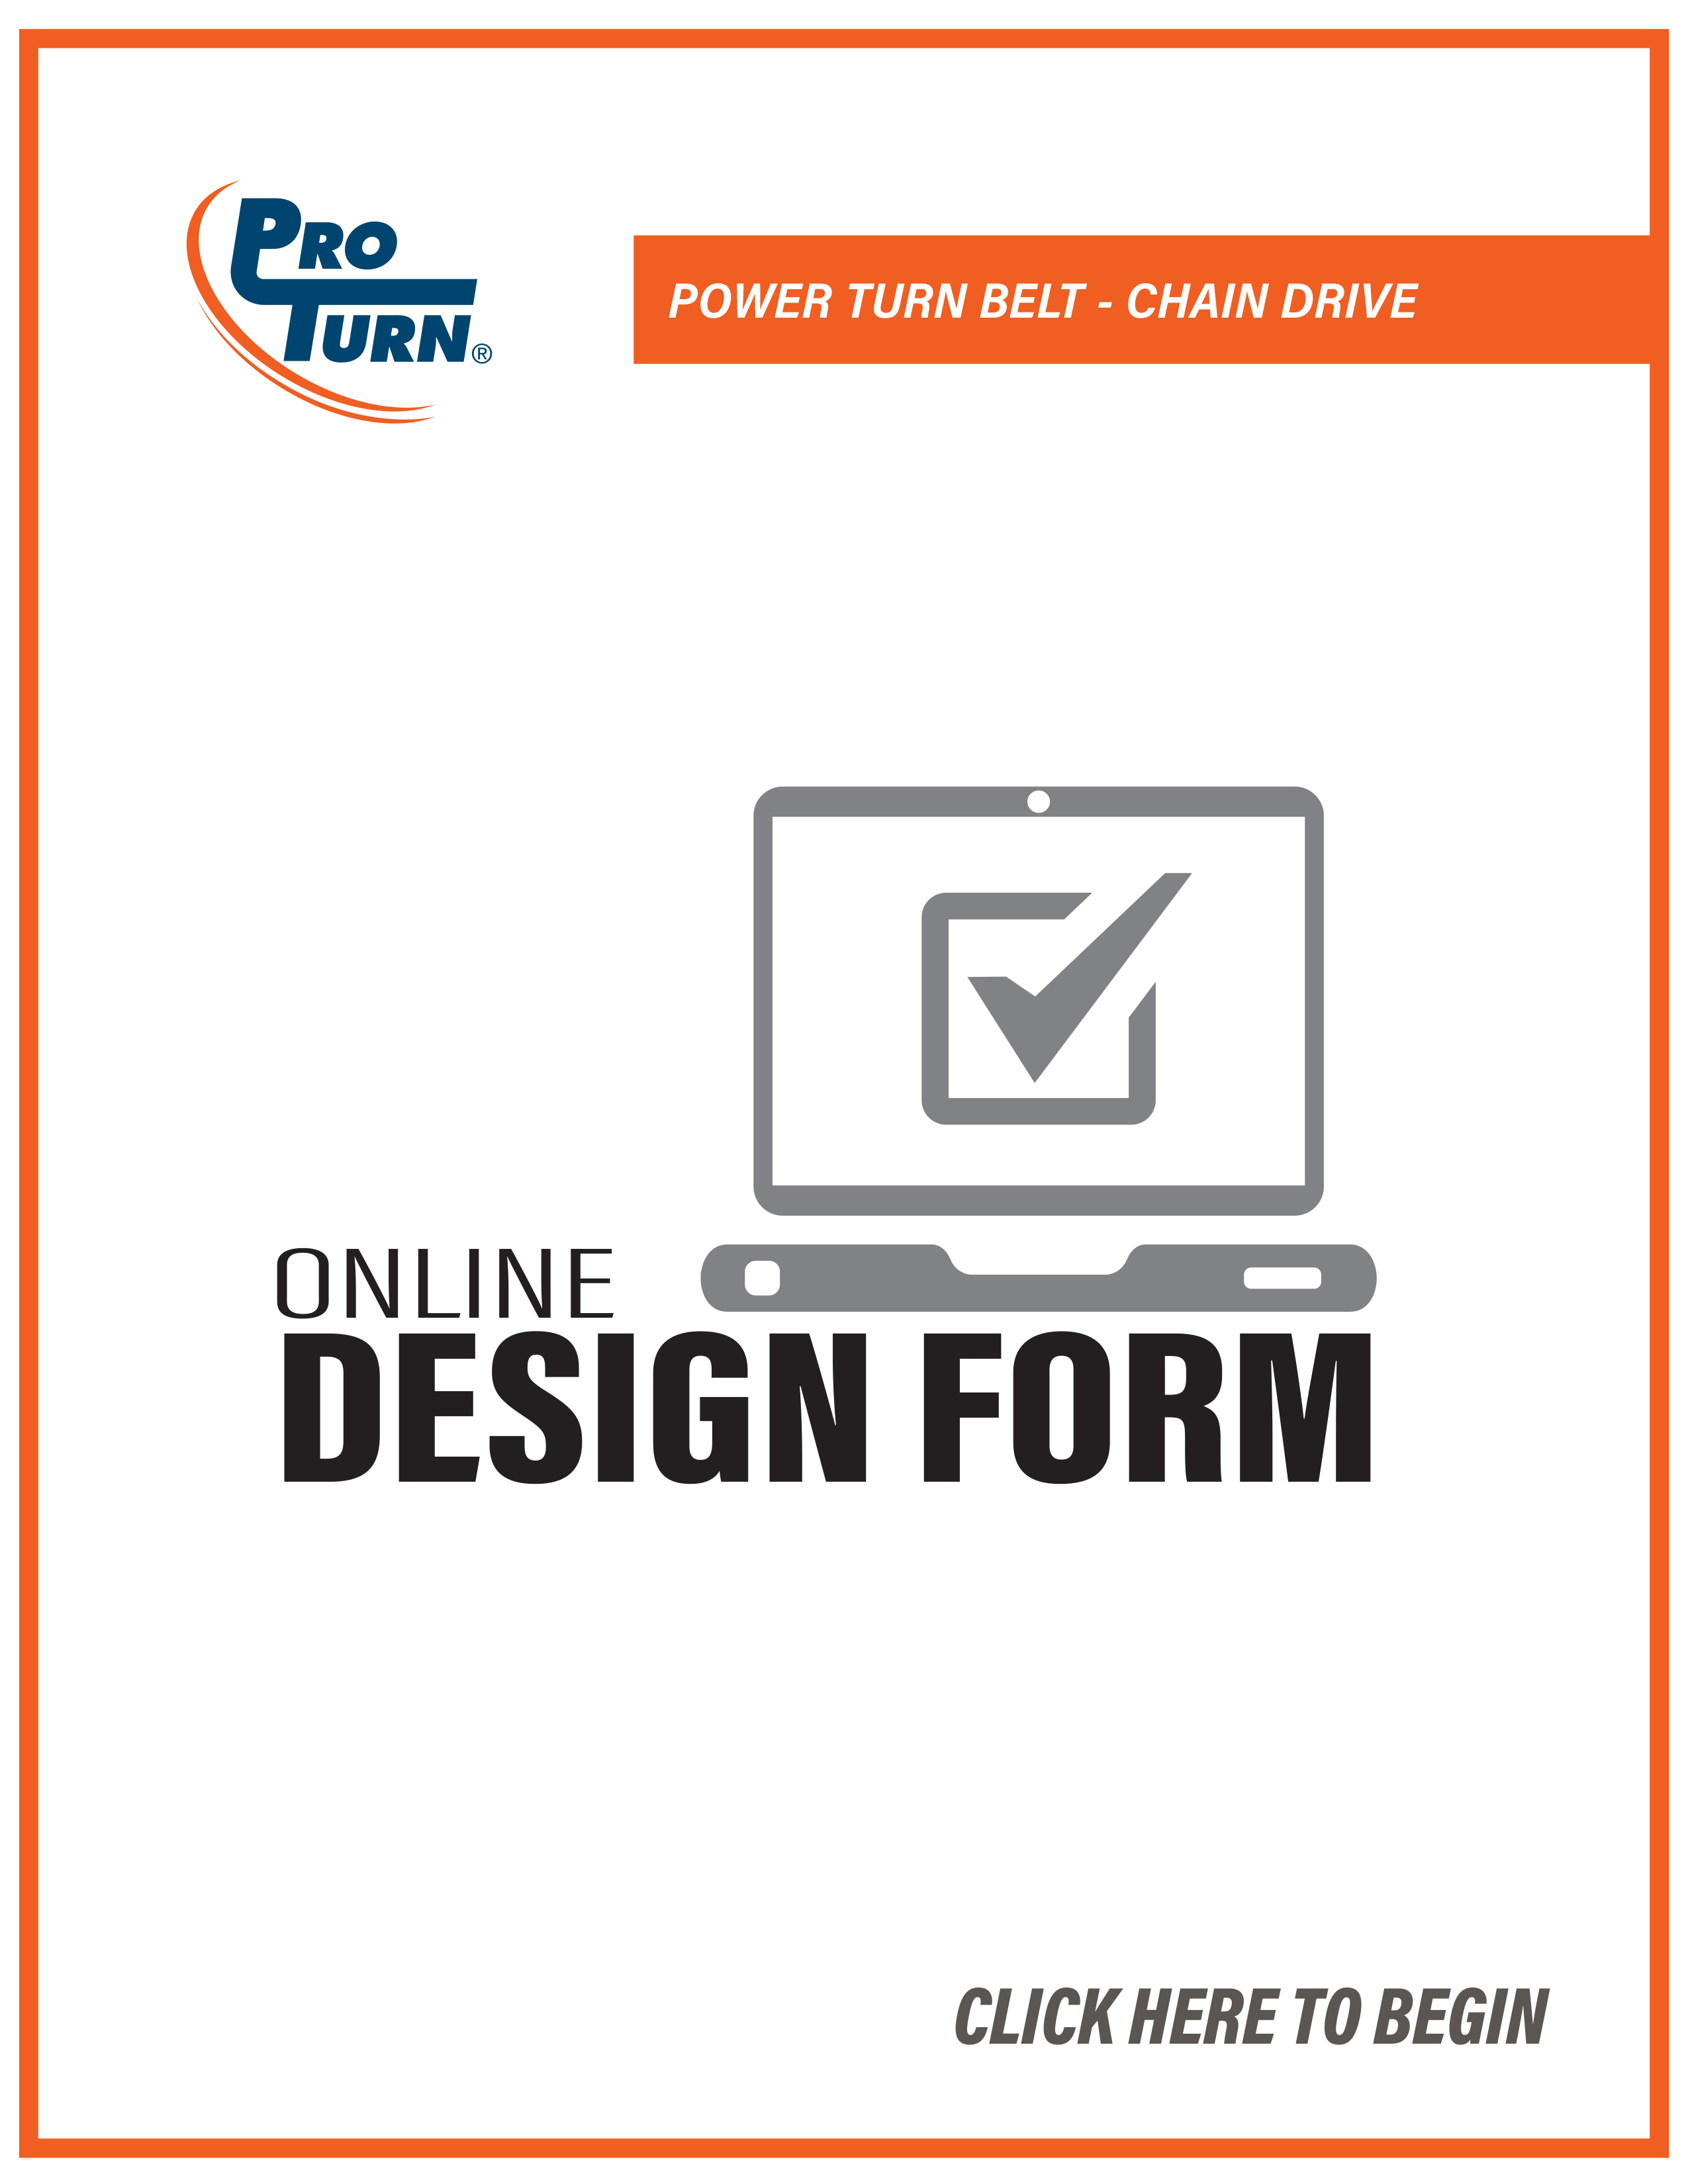 ProTurn - Power Turn Belt - Chain Drive